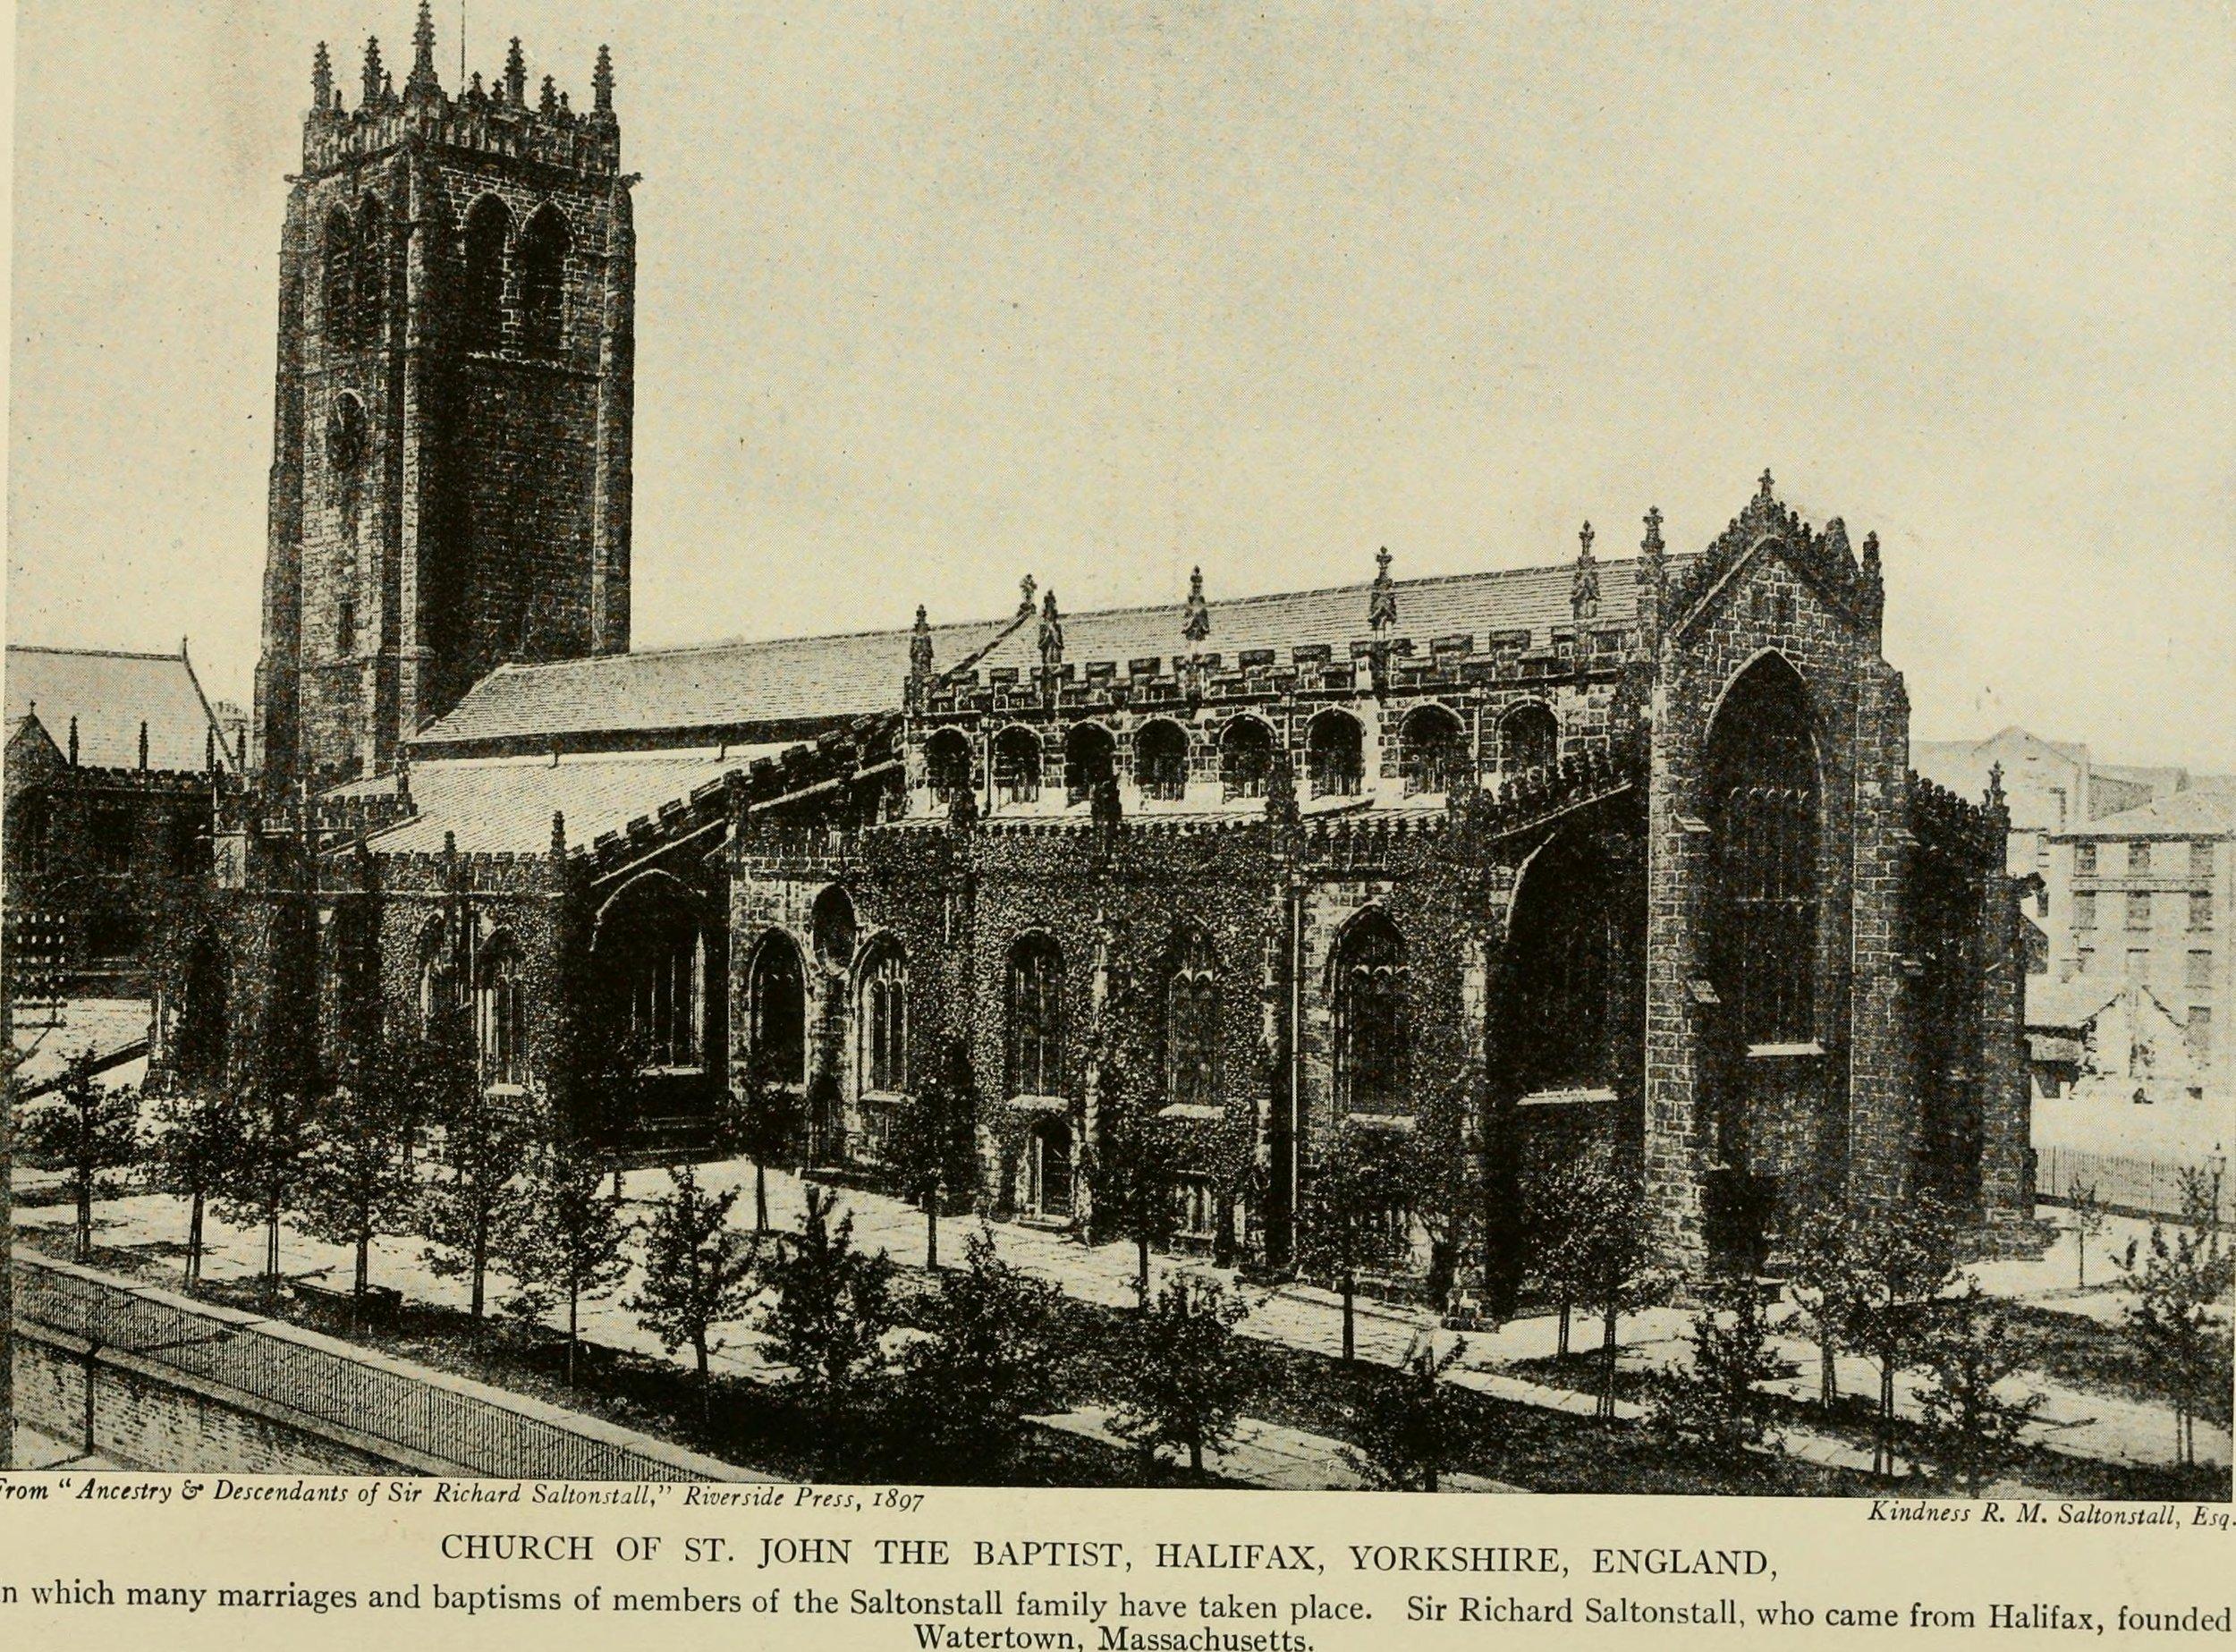 Halifax Parish Church, West Yorkshire, England The Church of Jonathan and Grace Fairbanks